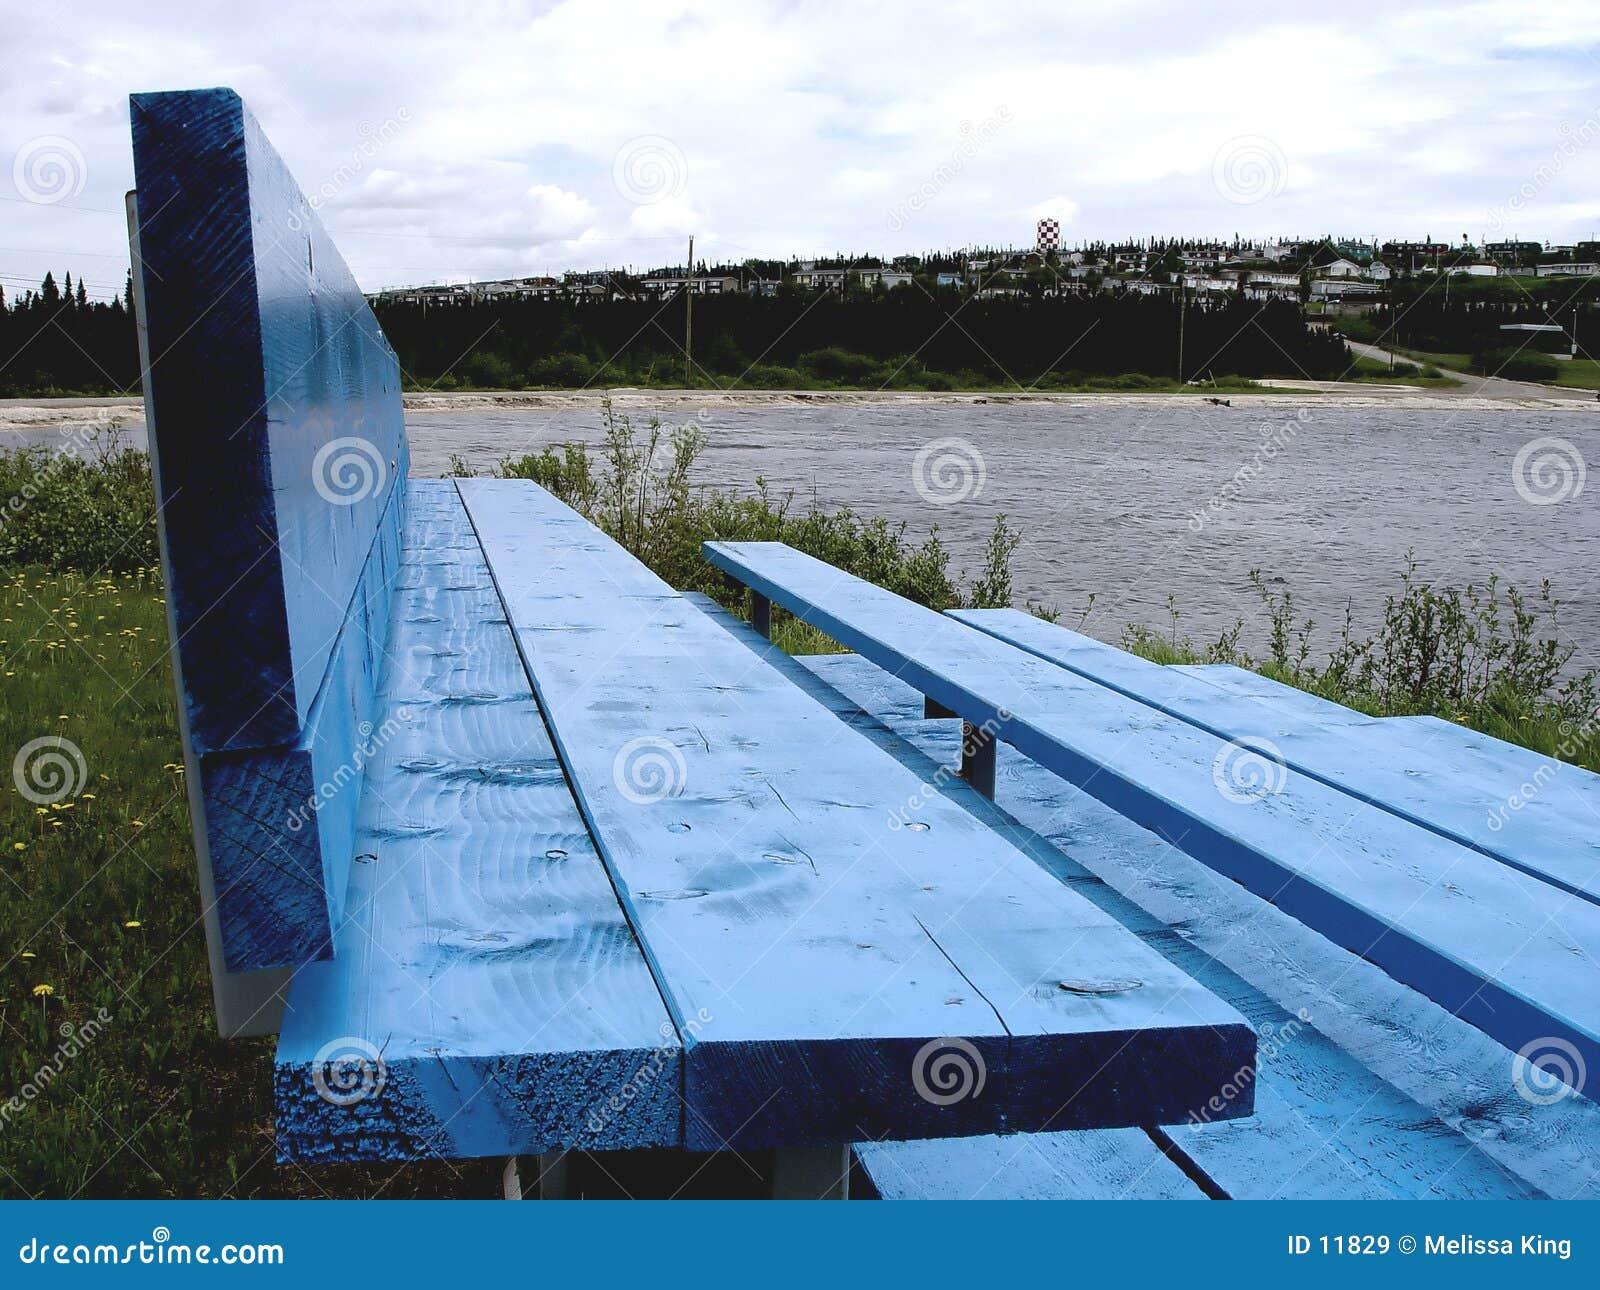 Blue Park Bench